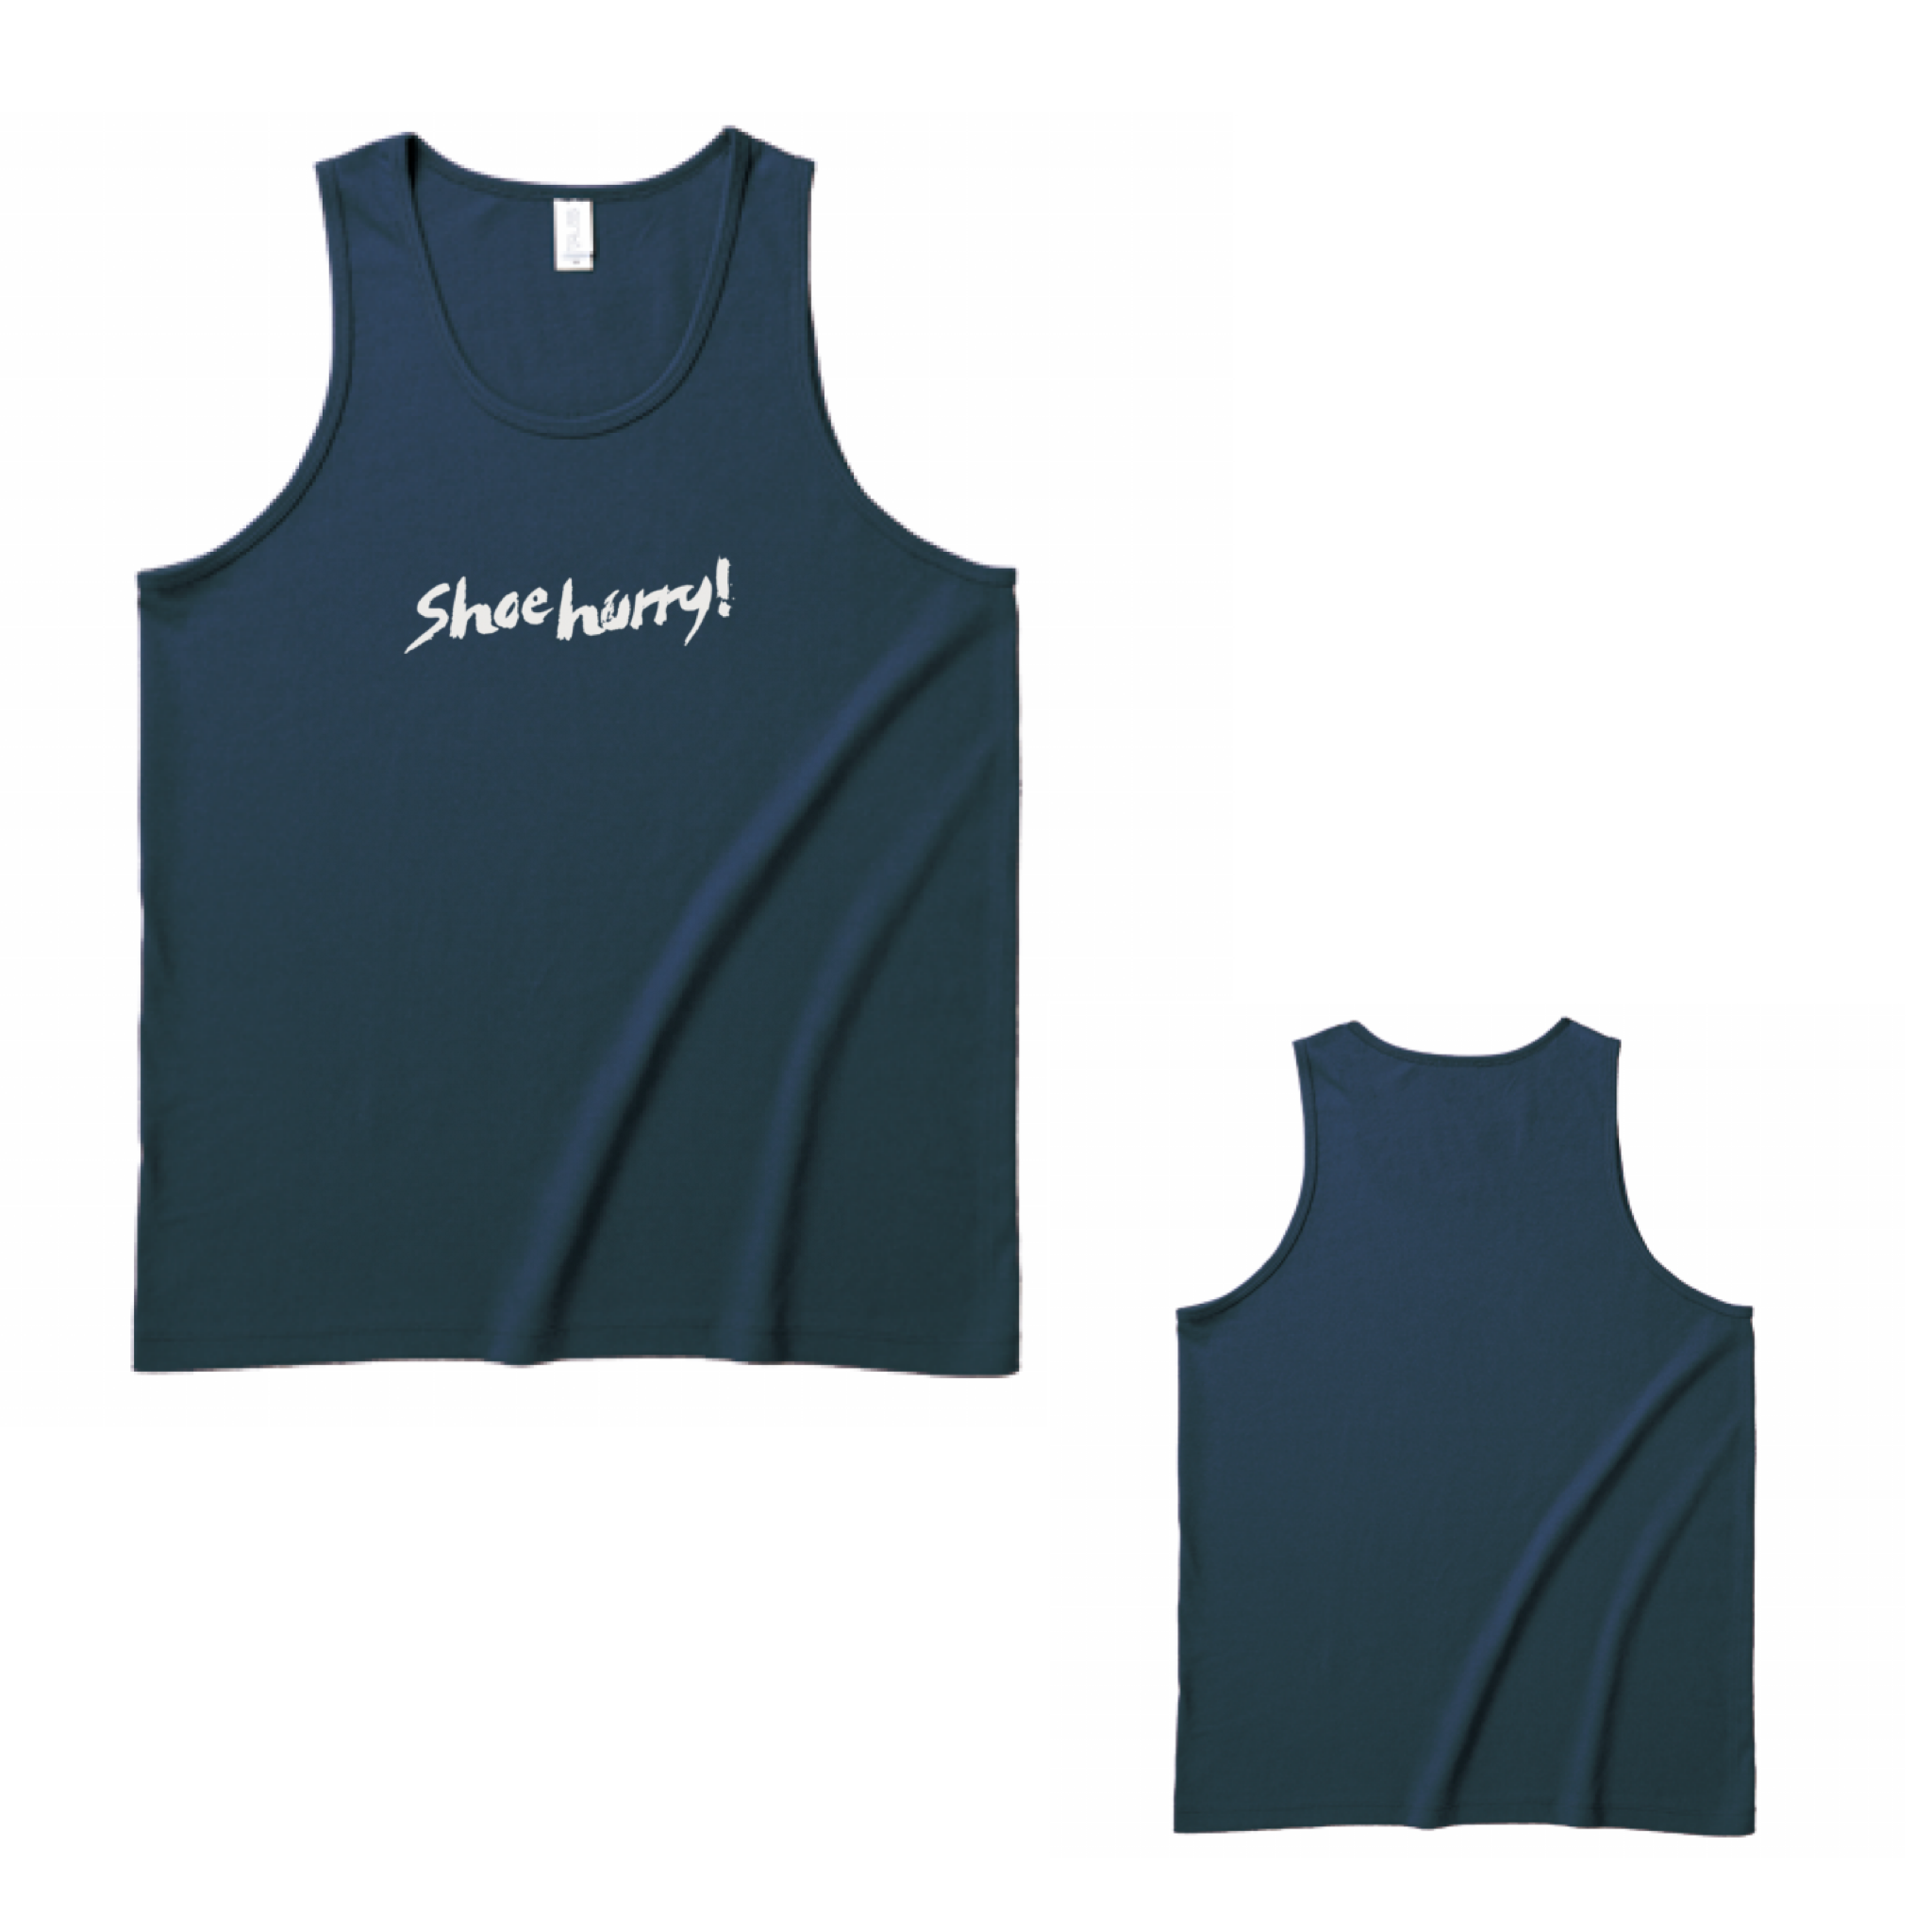 SHOEHURRY LOGO TANKTOP|タンクトップ(ネイビー/ホワイト)